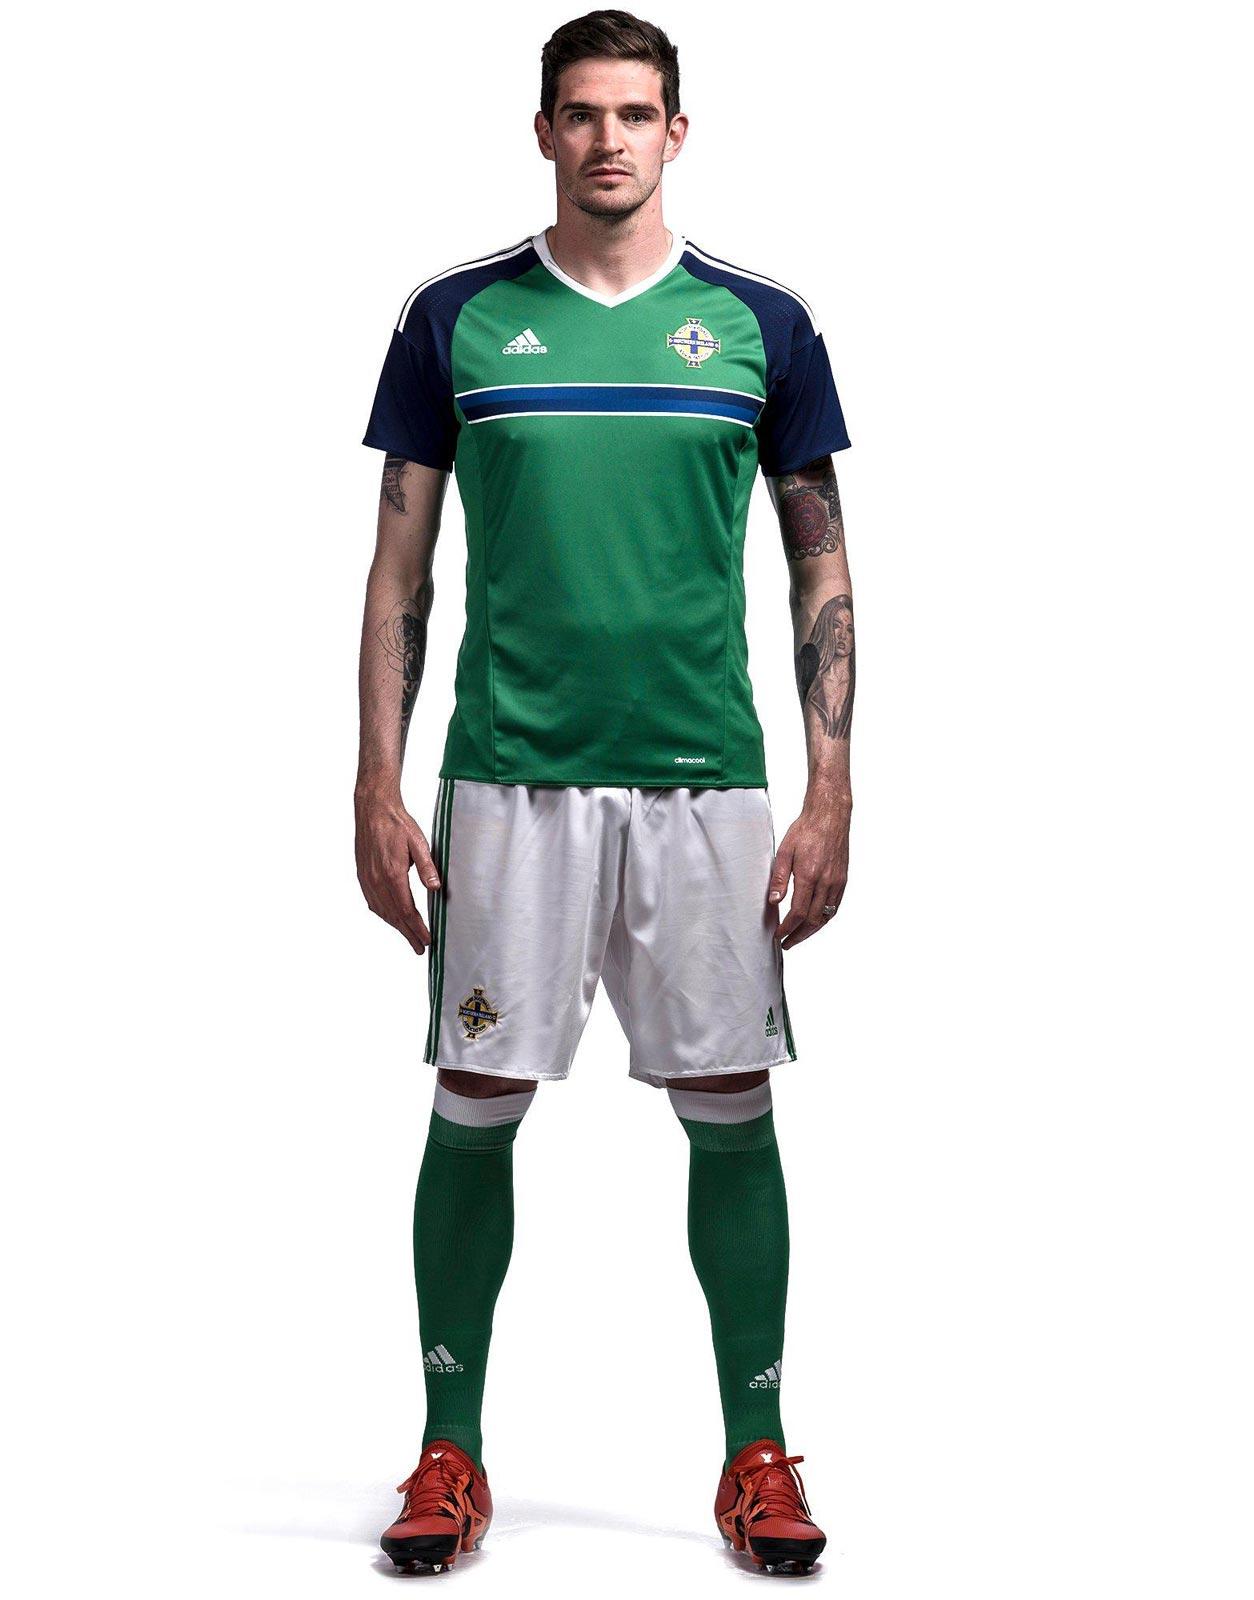 Northern Ireland Euro 2016 Home Kit Released - Footy Headlines